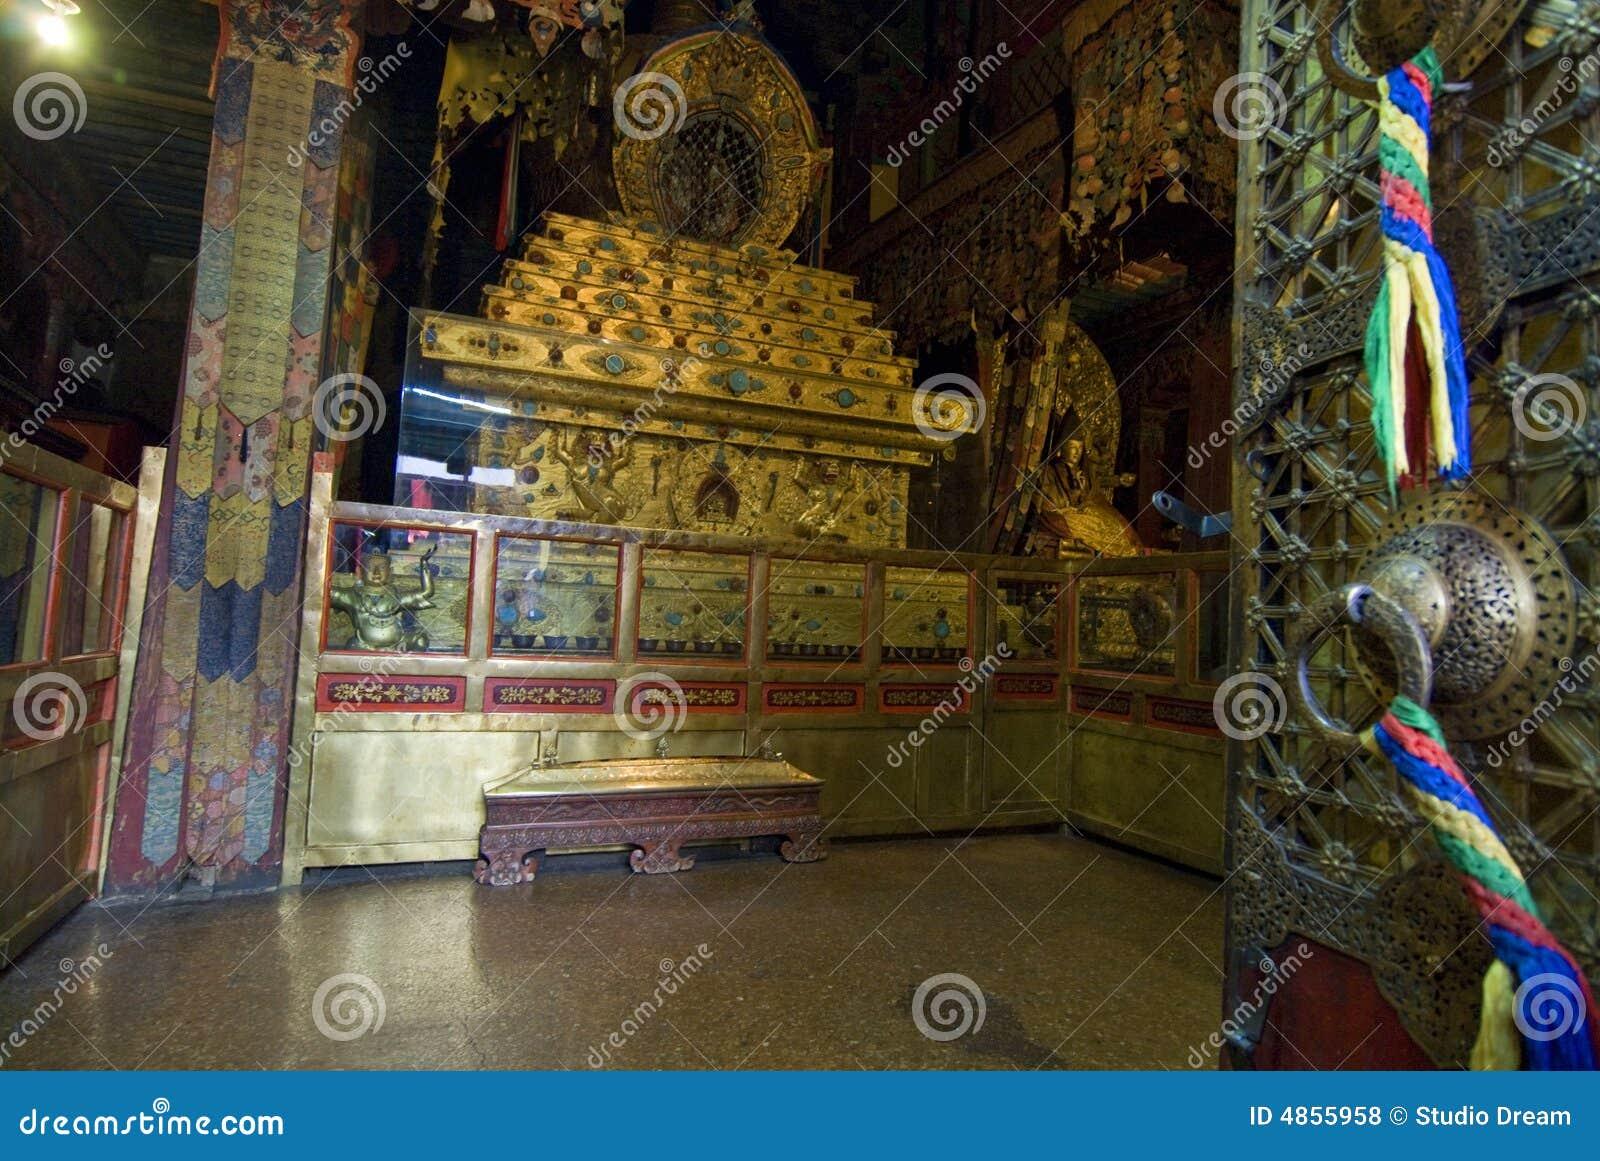 Dentro do palácio de Potala